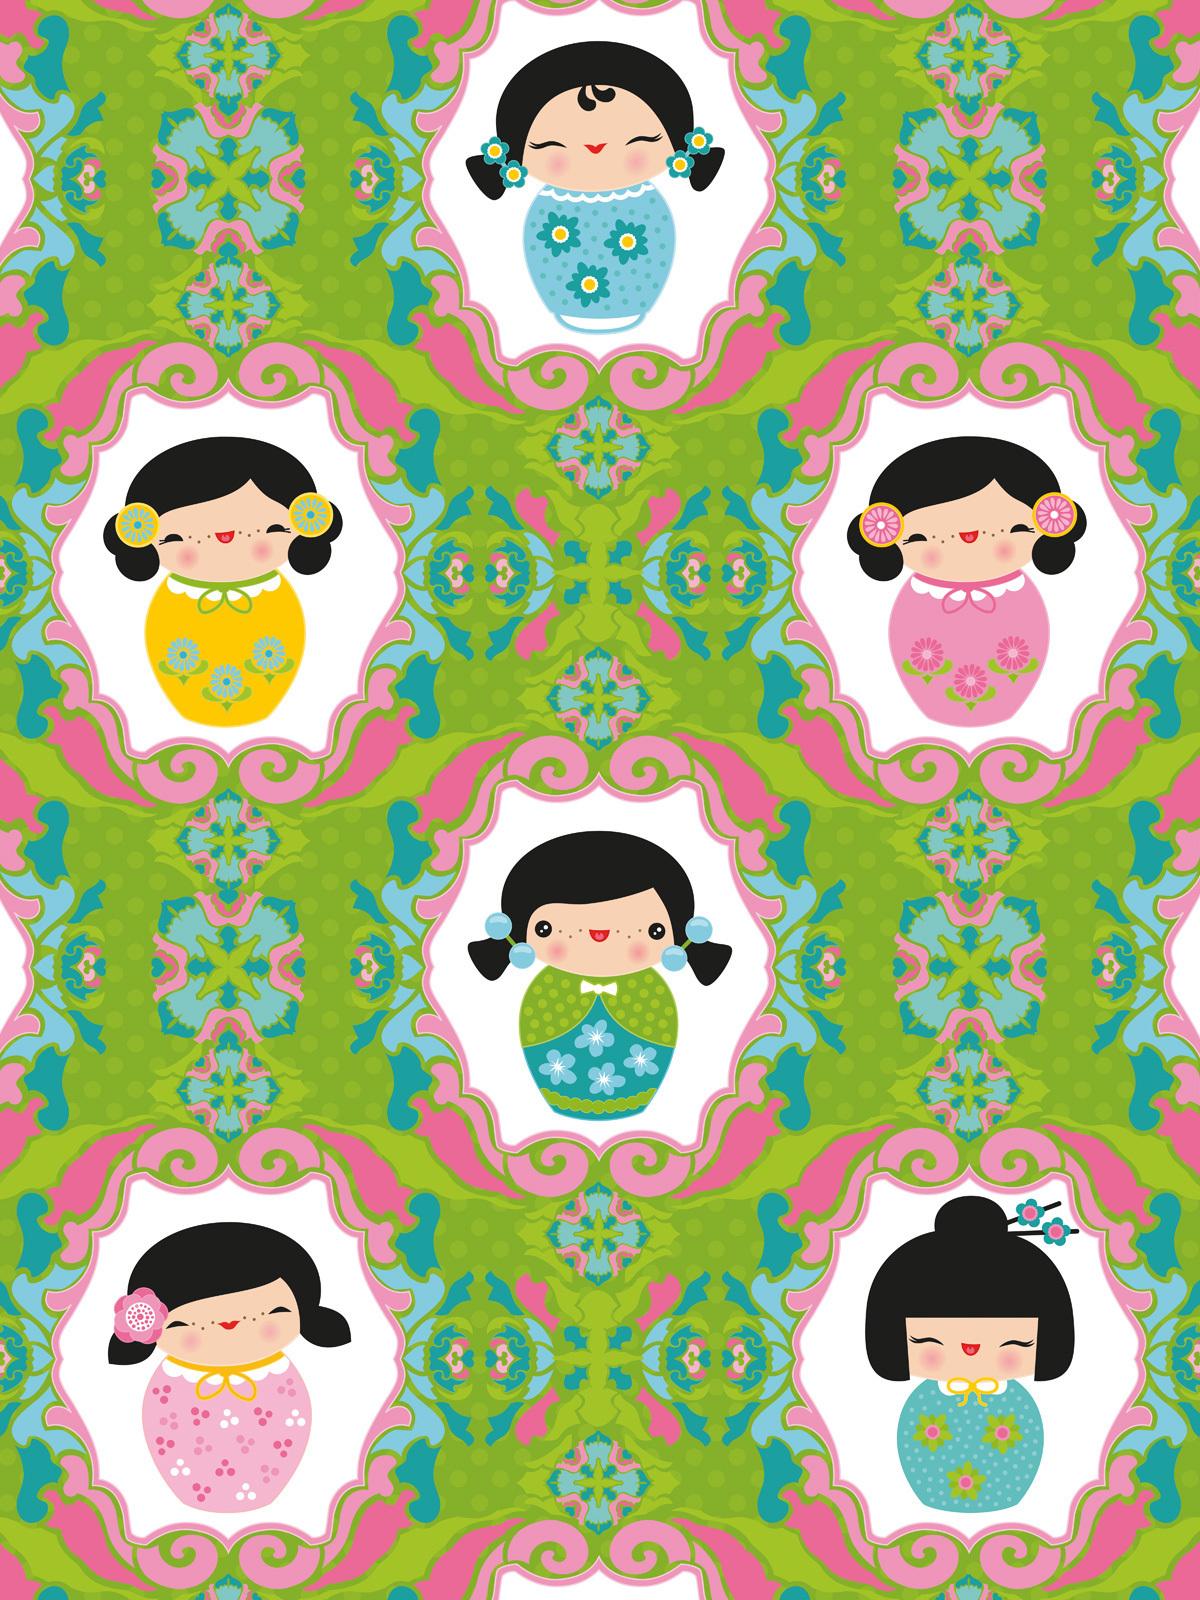 Full Size of Wandbild Kinderzimmer Tapeten Kokeshi Dolls Grn Miyo Mori Regal Wohnzimmer Regale Sofa Weiß Wandbilder Schlafzimmer Kinderzimmer Wandbild Kinderzimmer